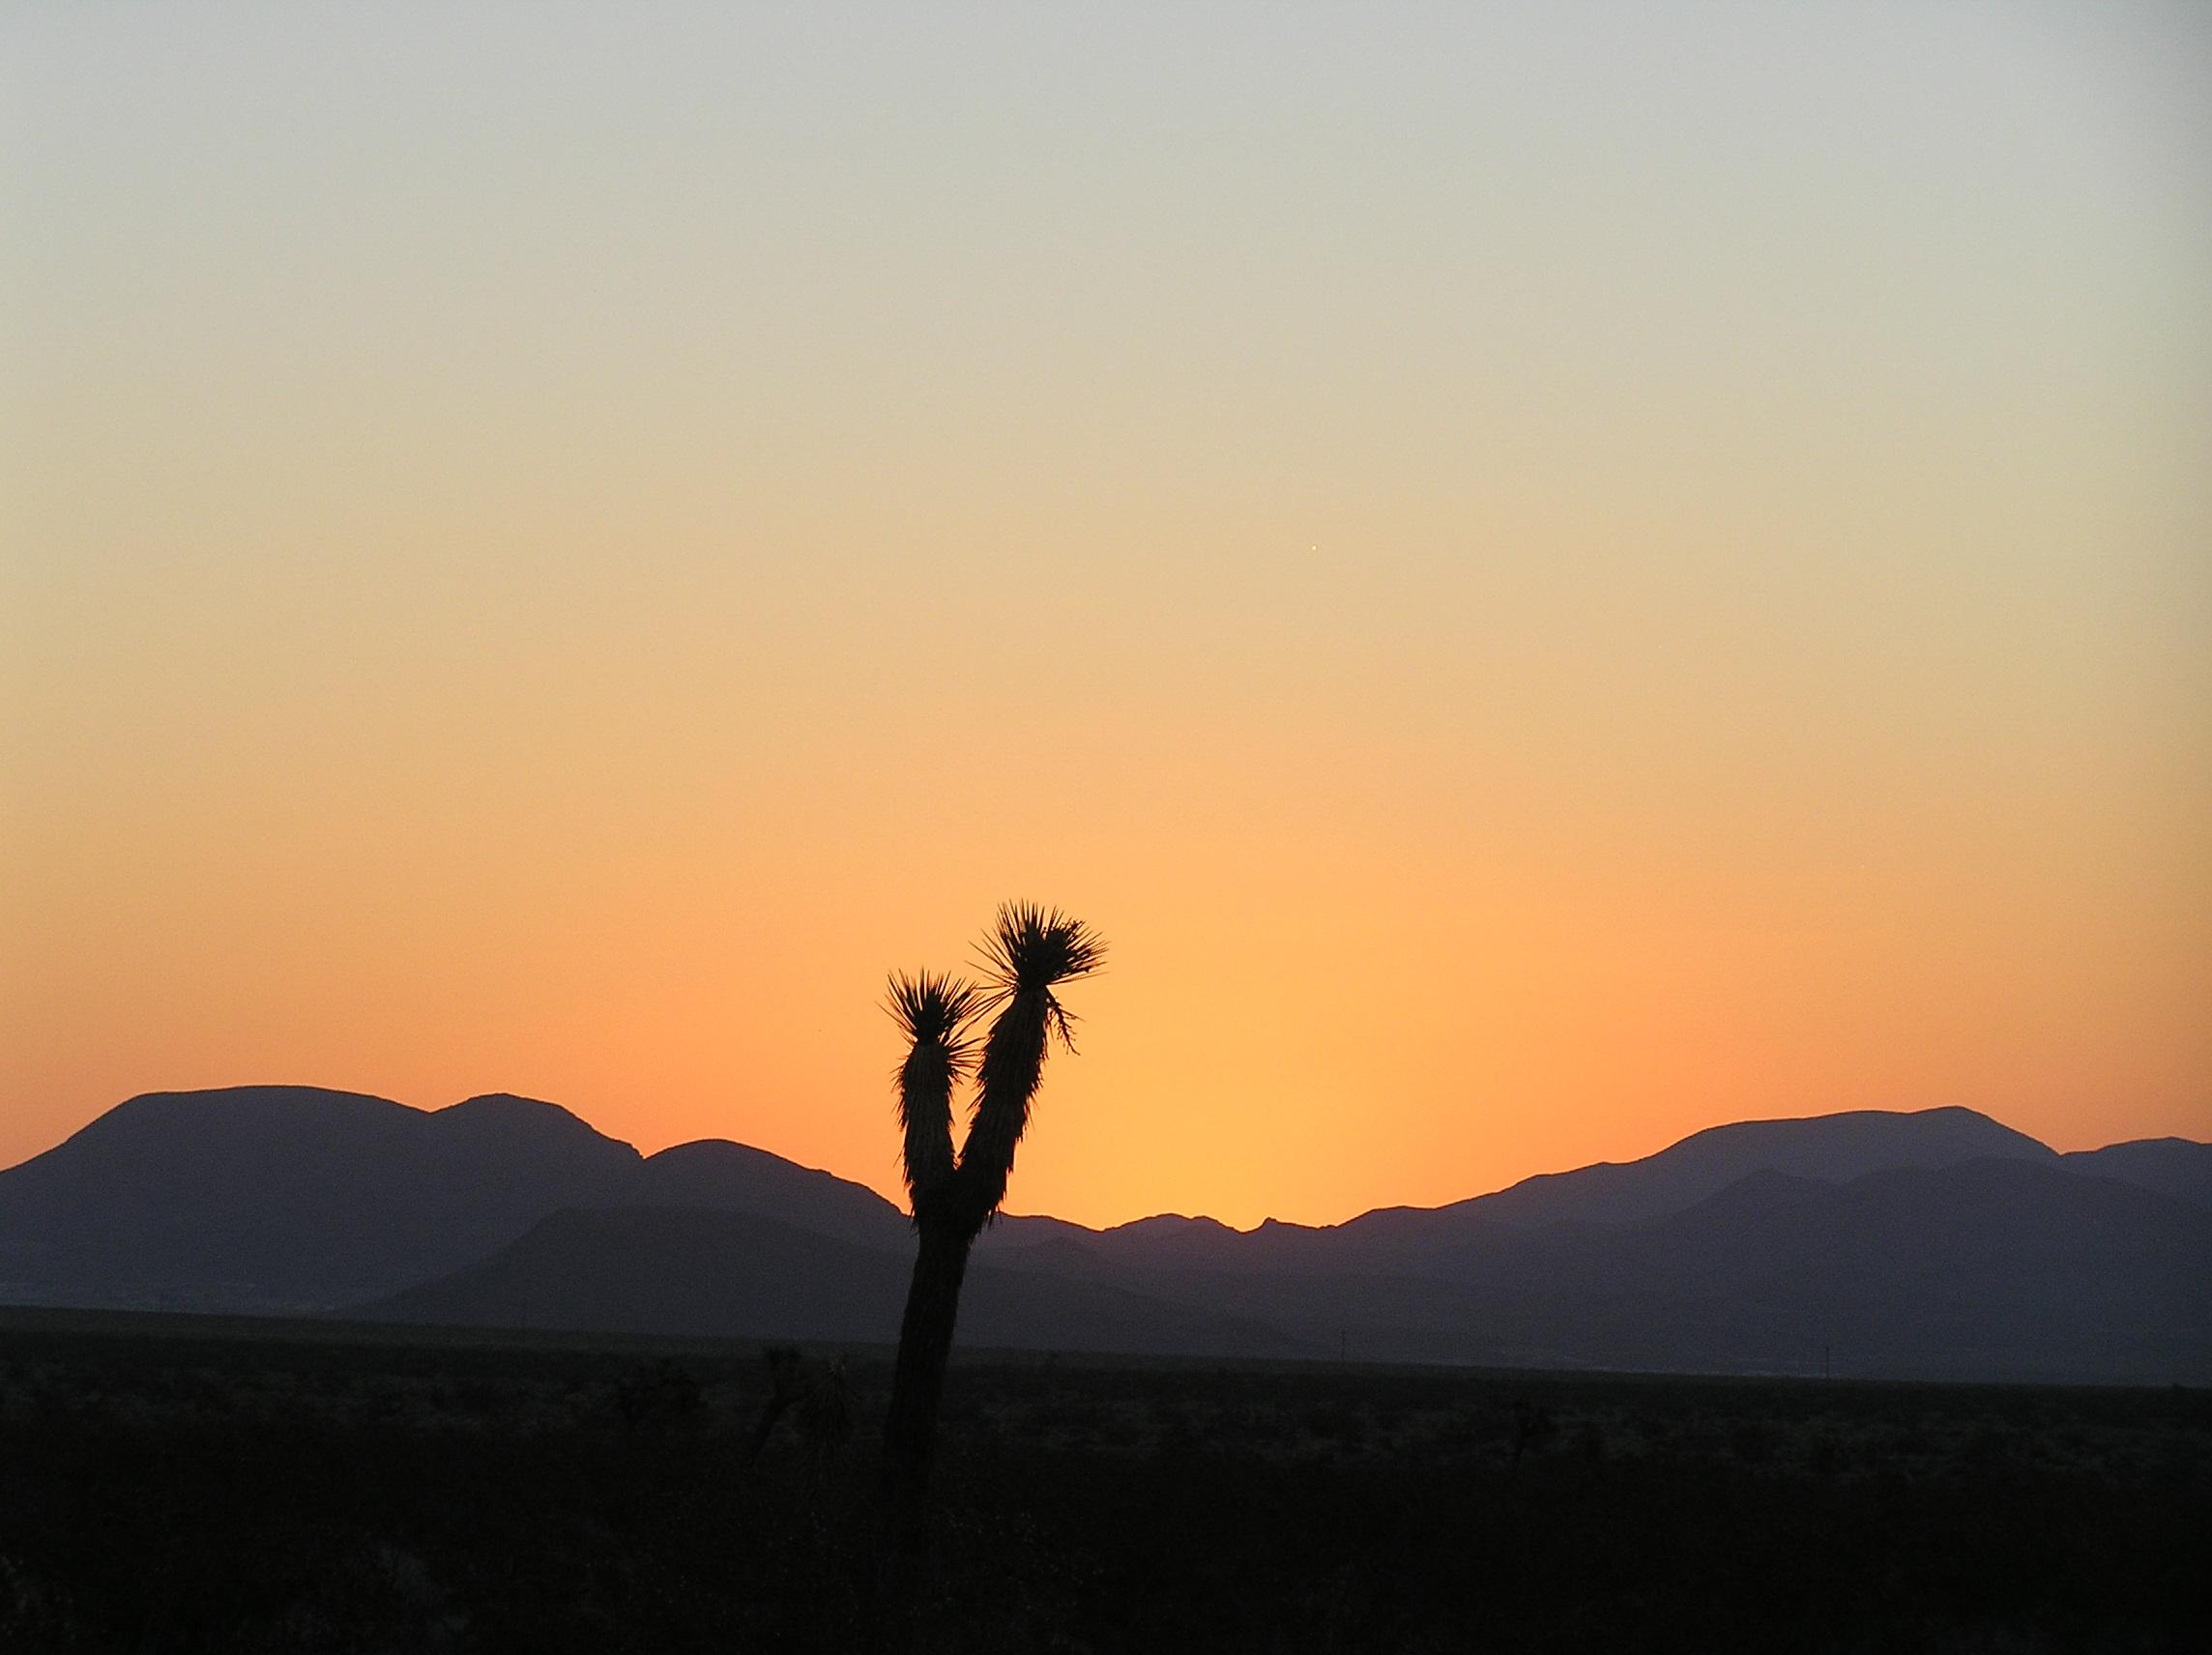 Joshua Tree at sunrise, Mojave Desert, California